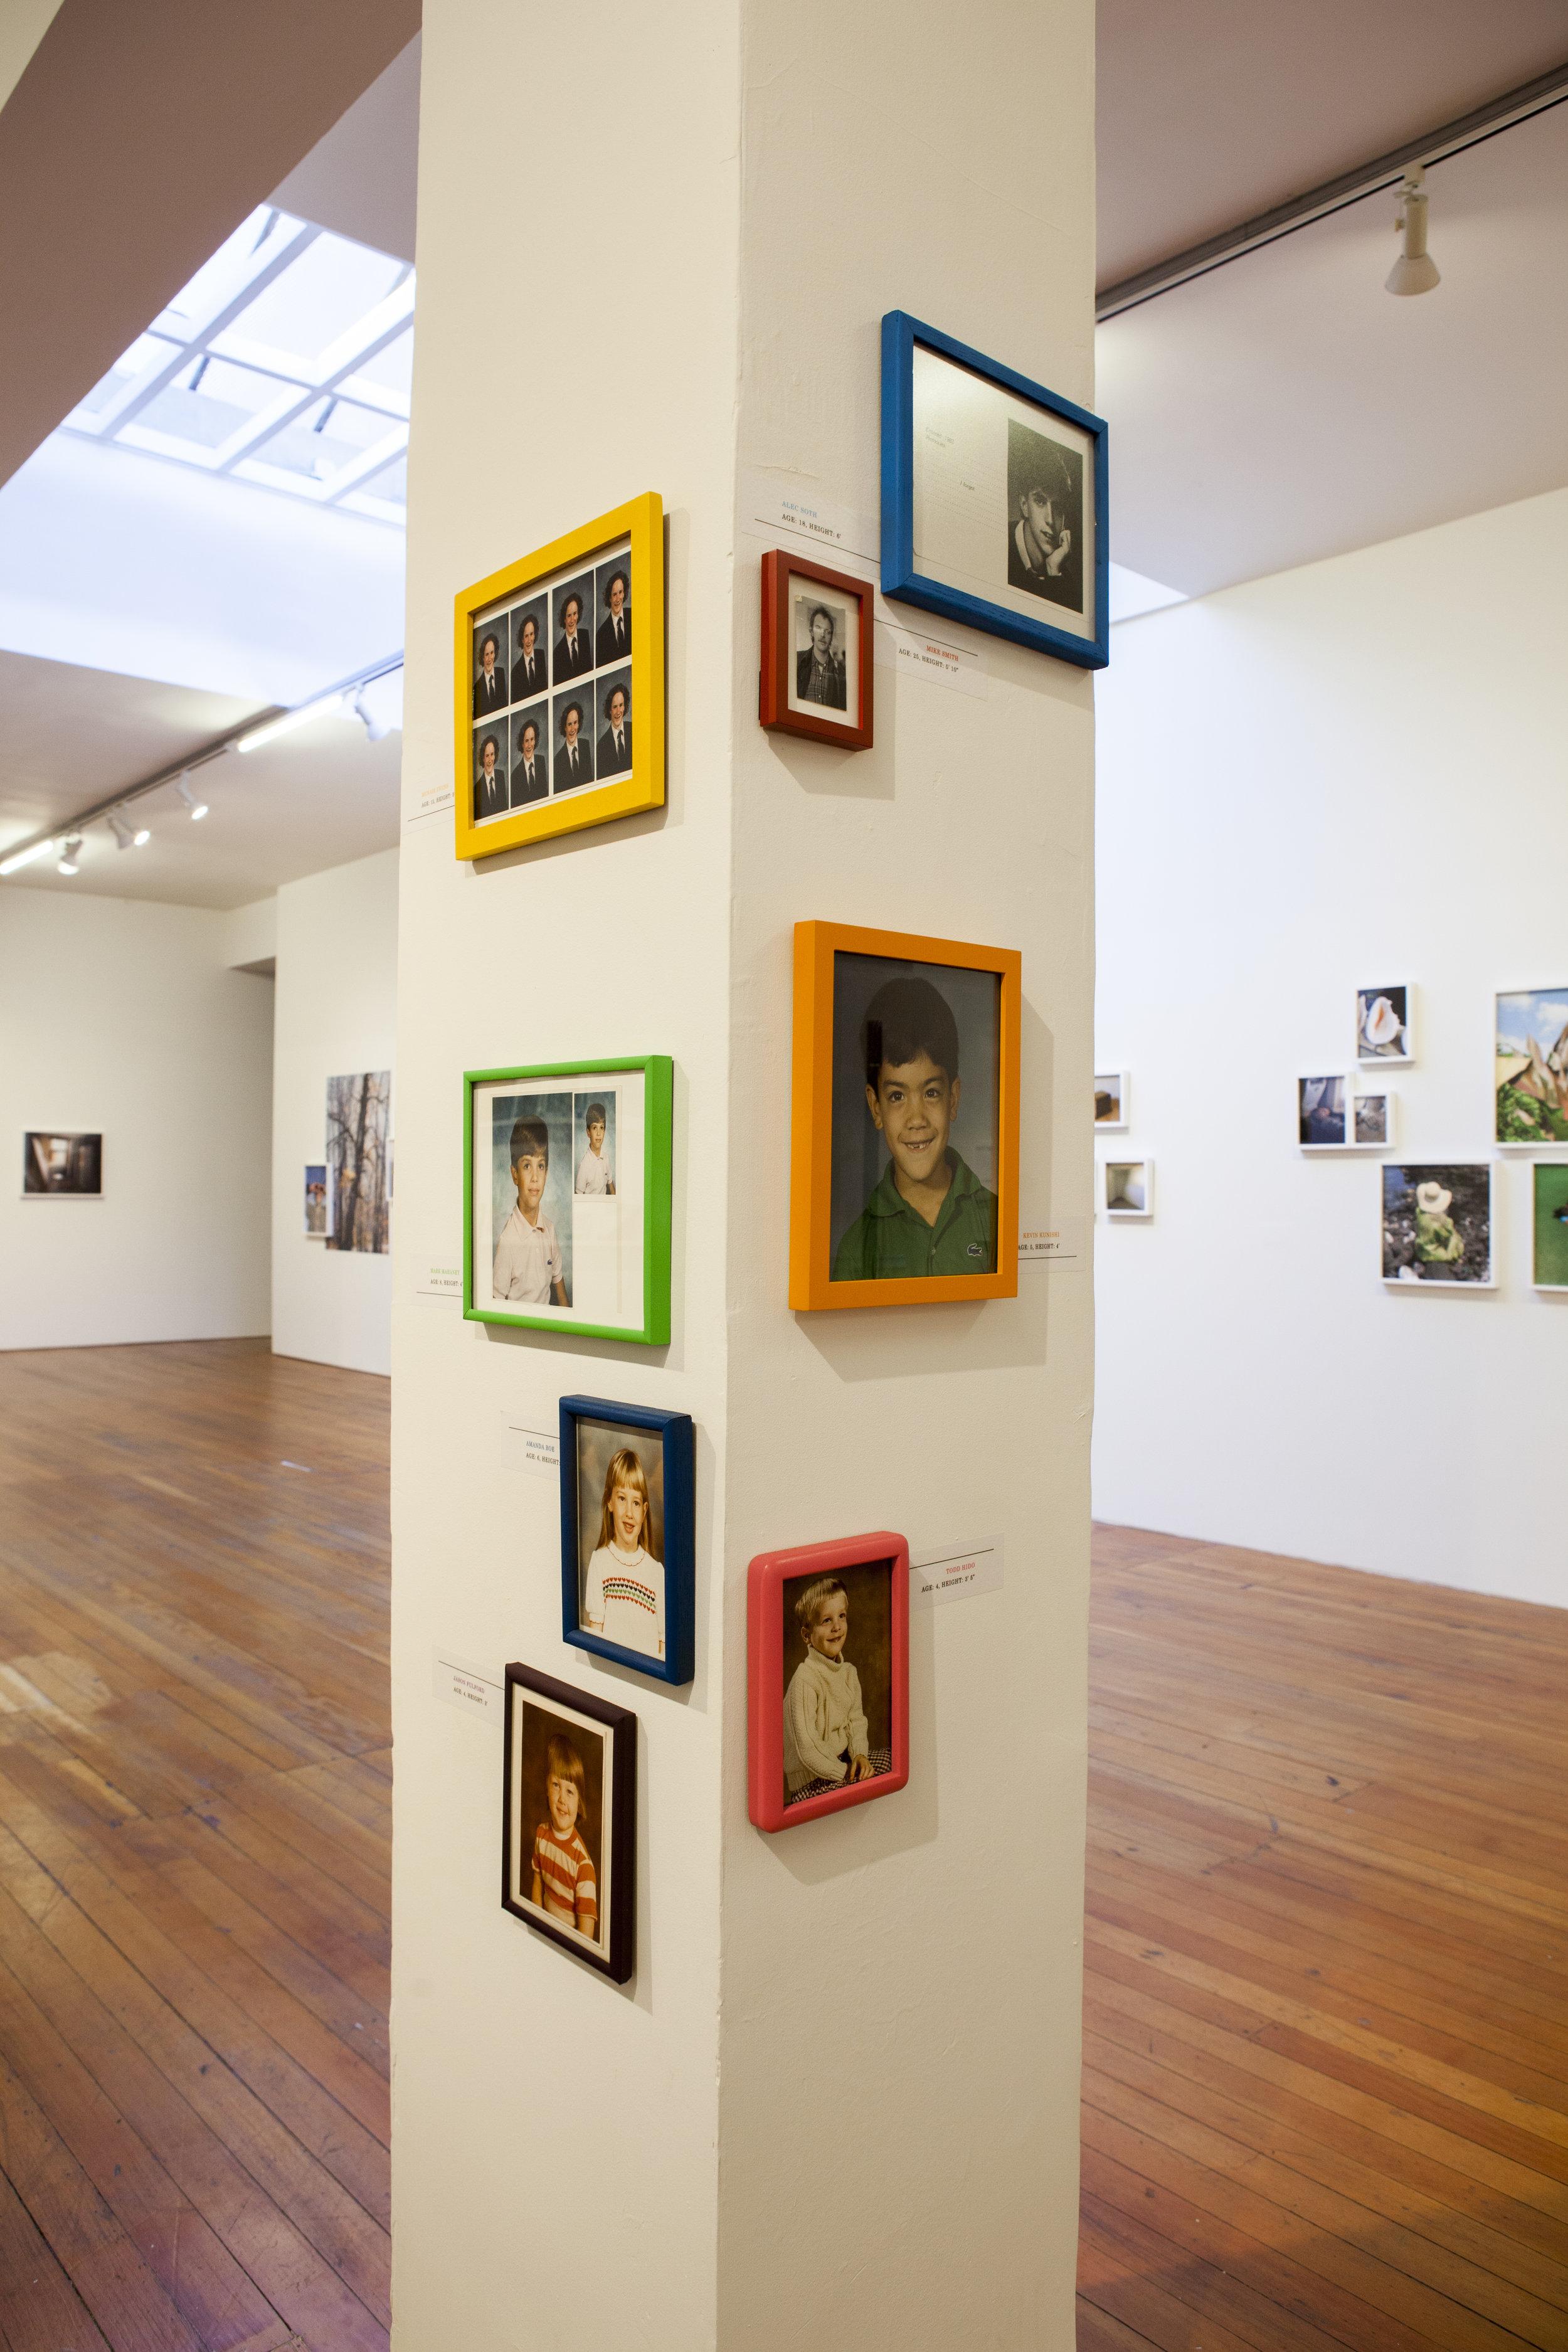 Installation view of artists school portraits.